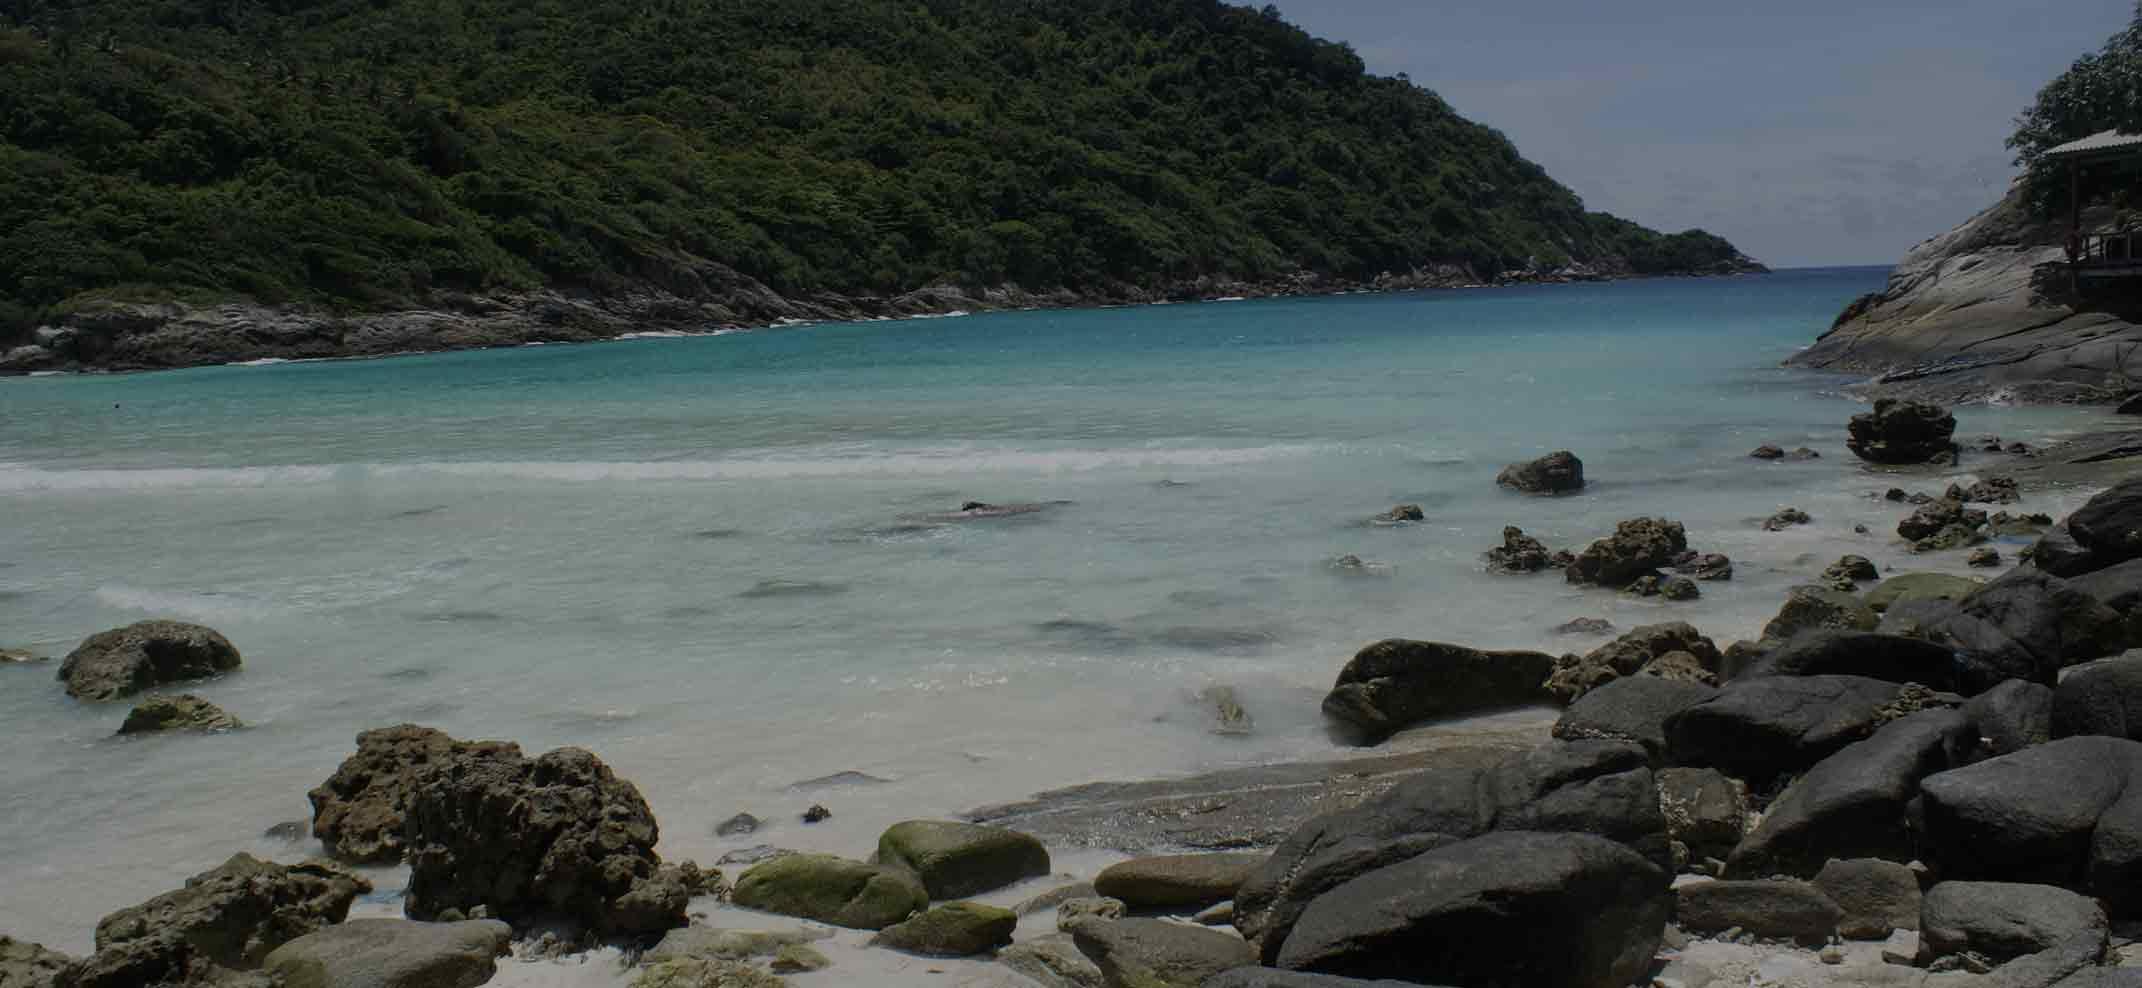 aoyon-sailing-watersports-centre-beach-racha-island-slider